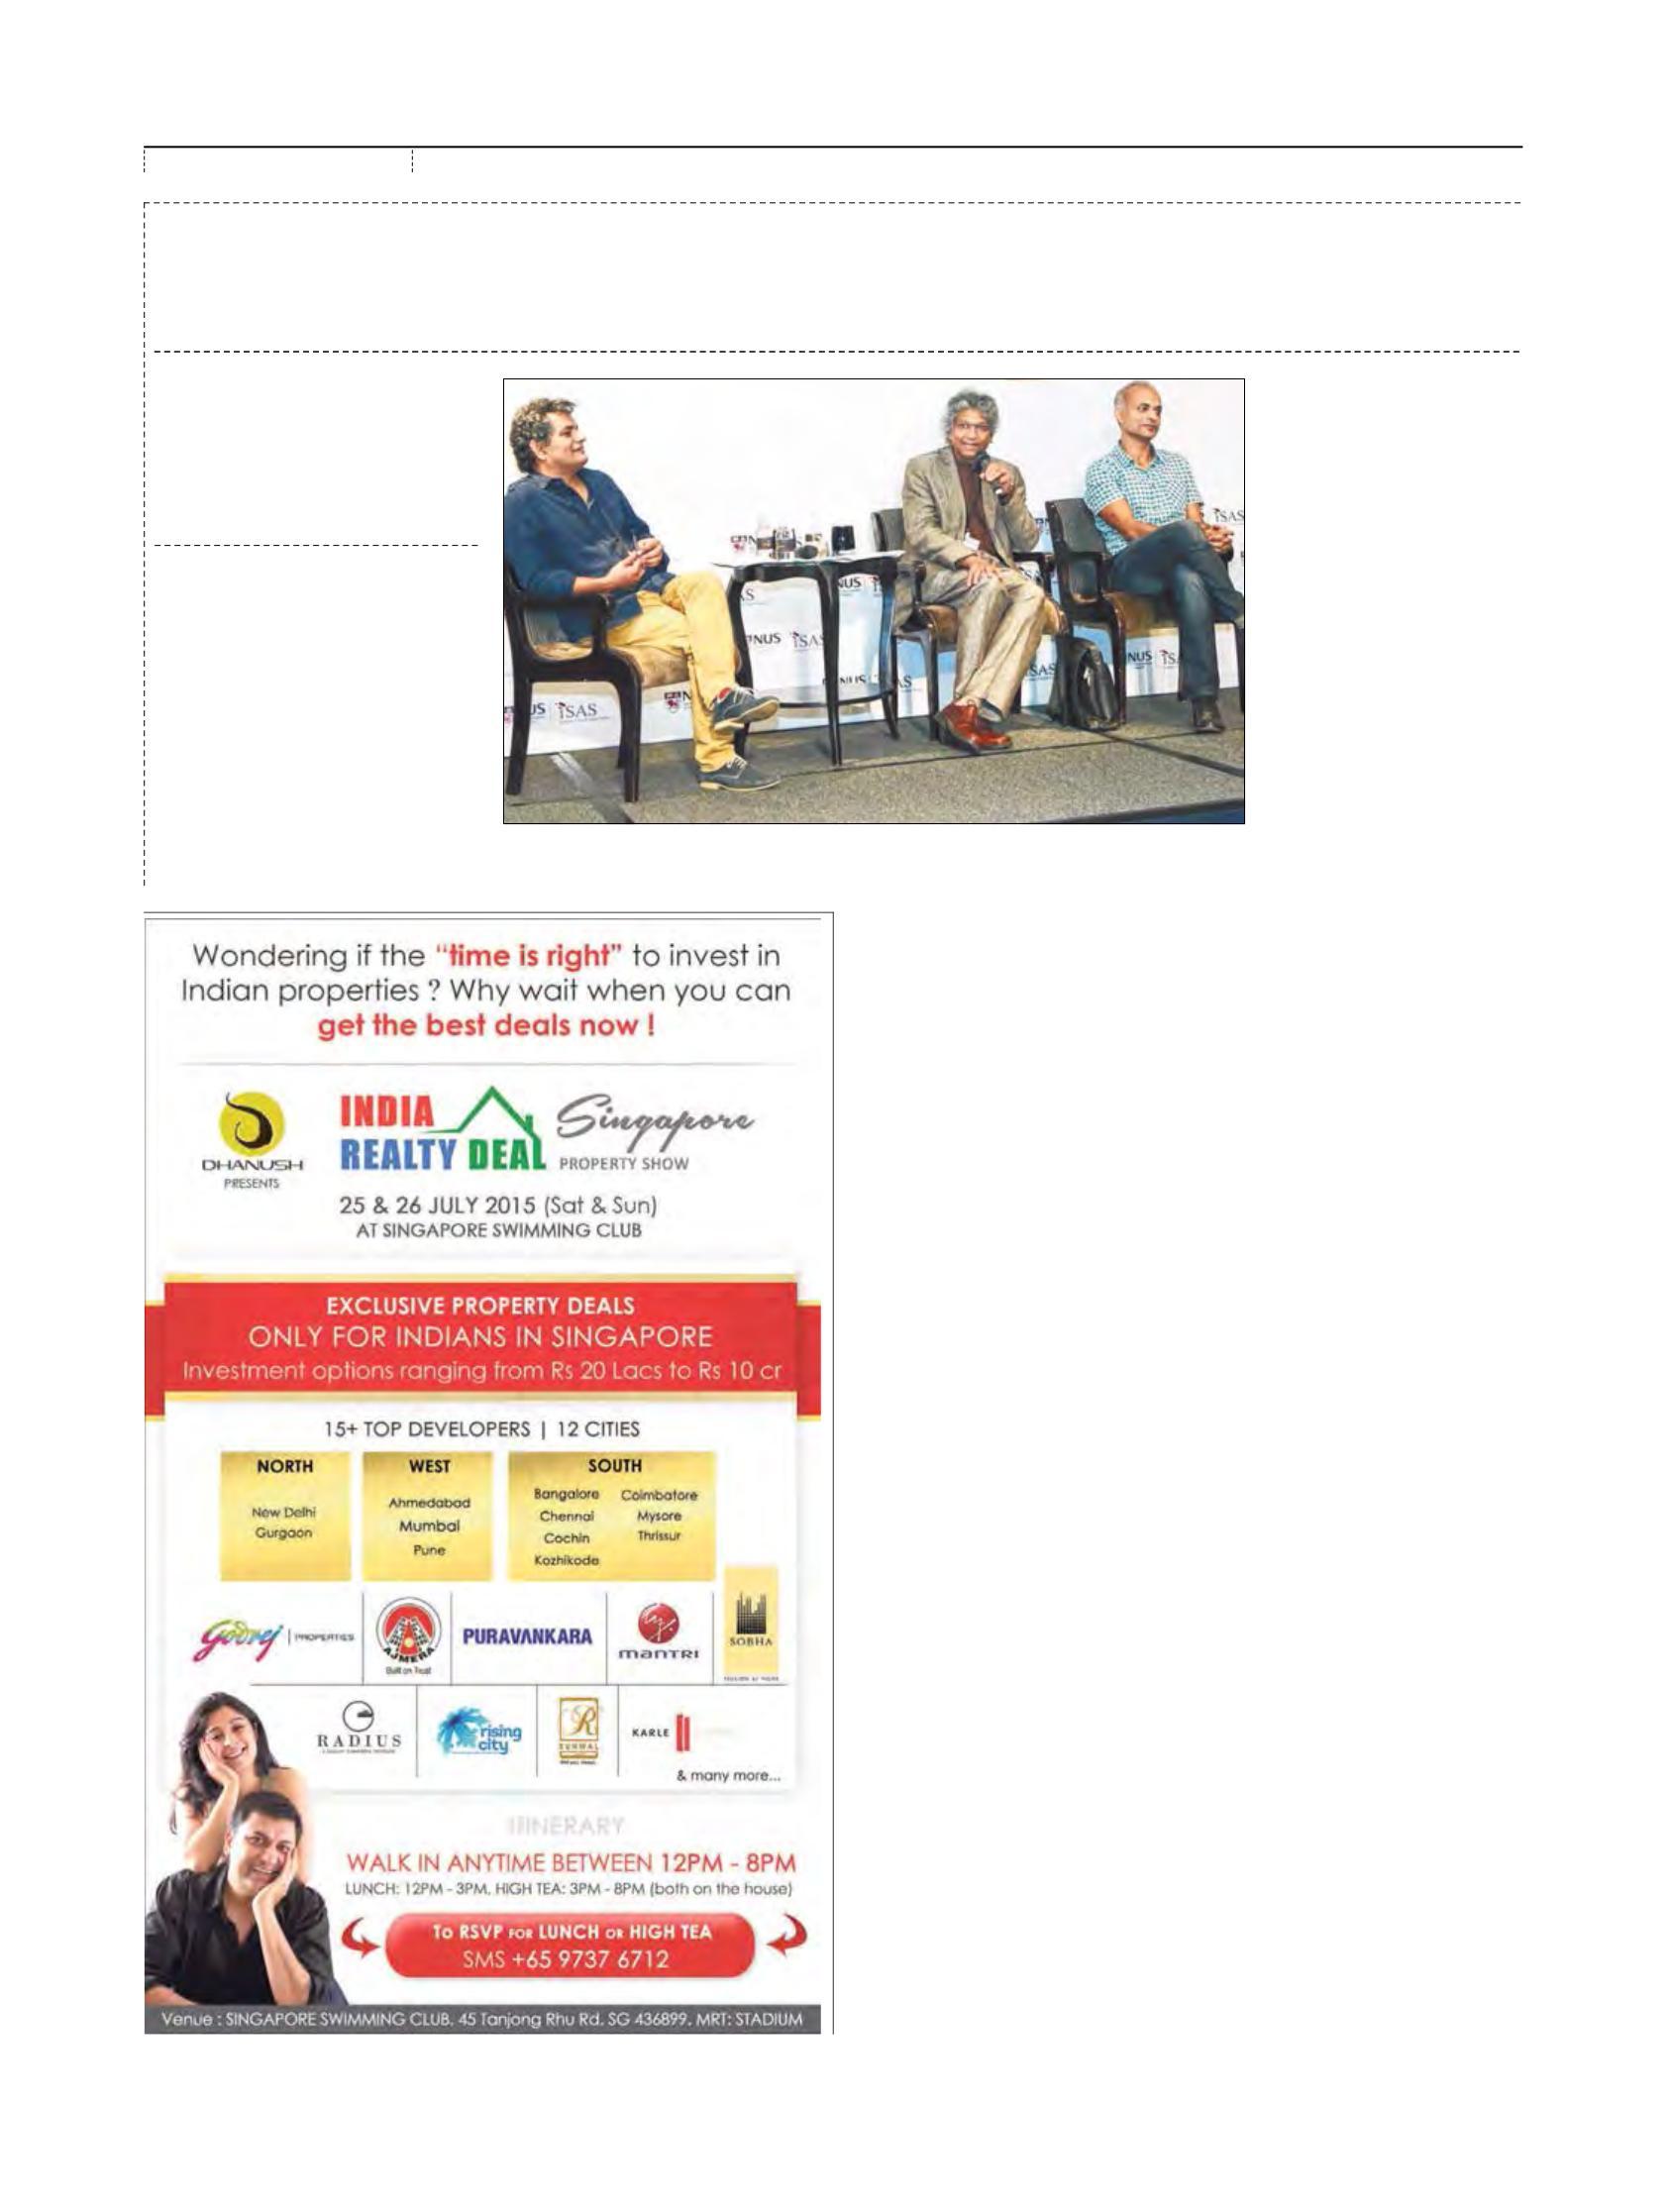 Mi marathi krupasindhu online dating